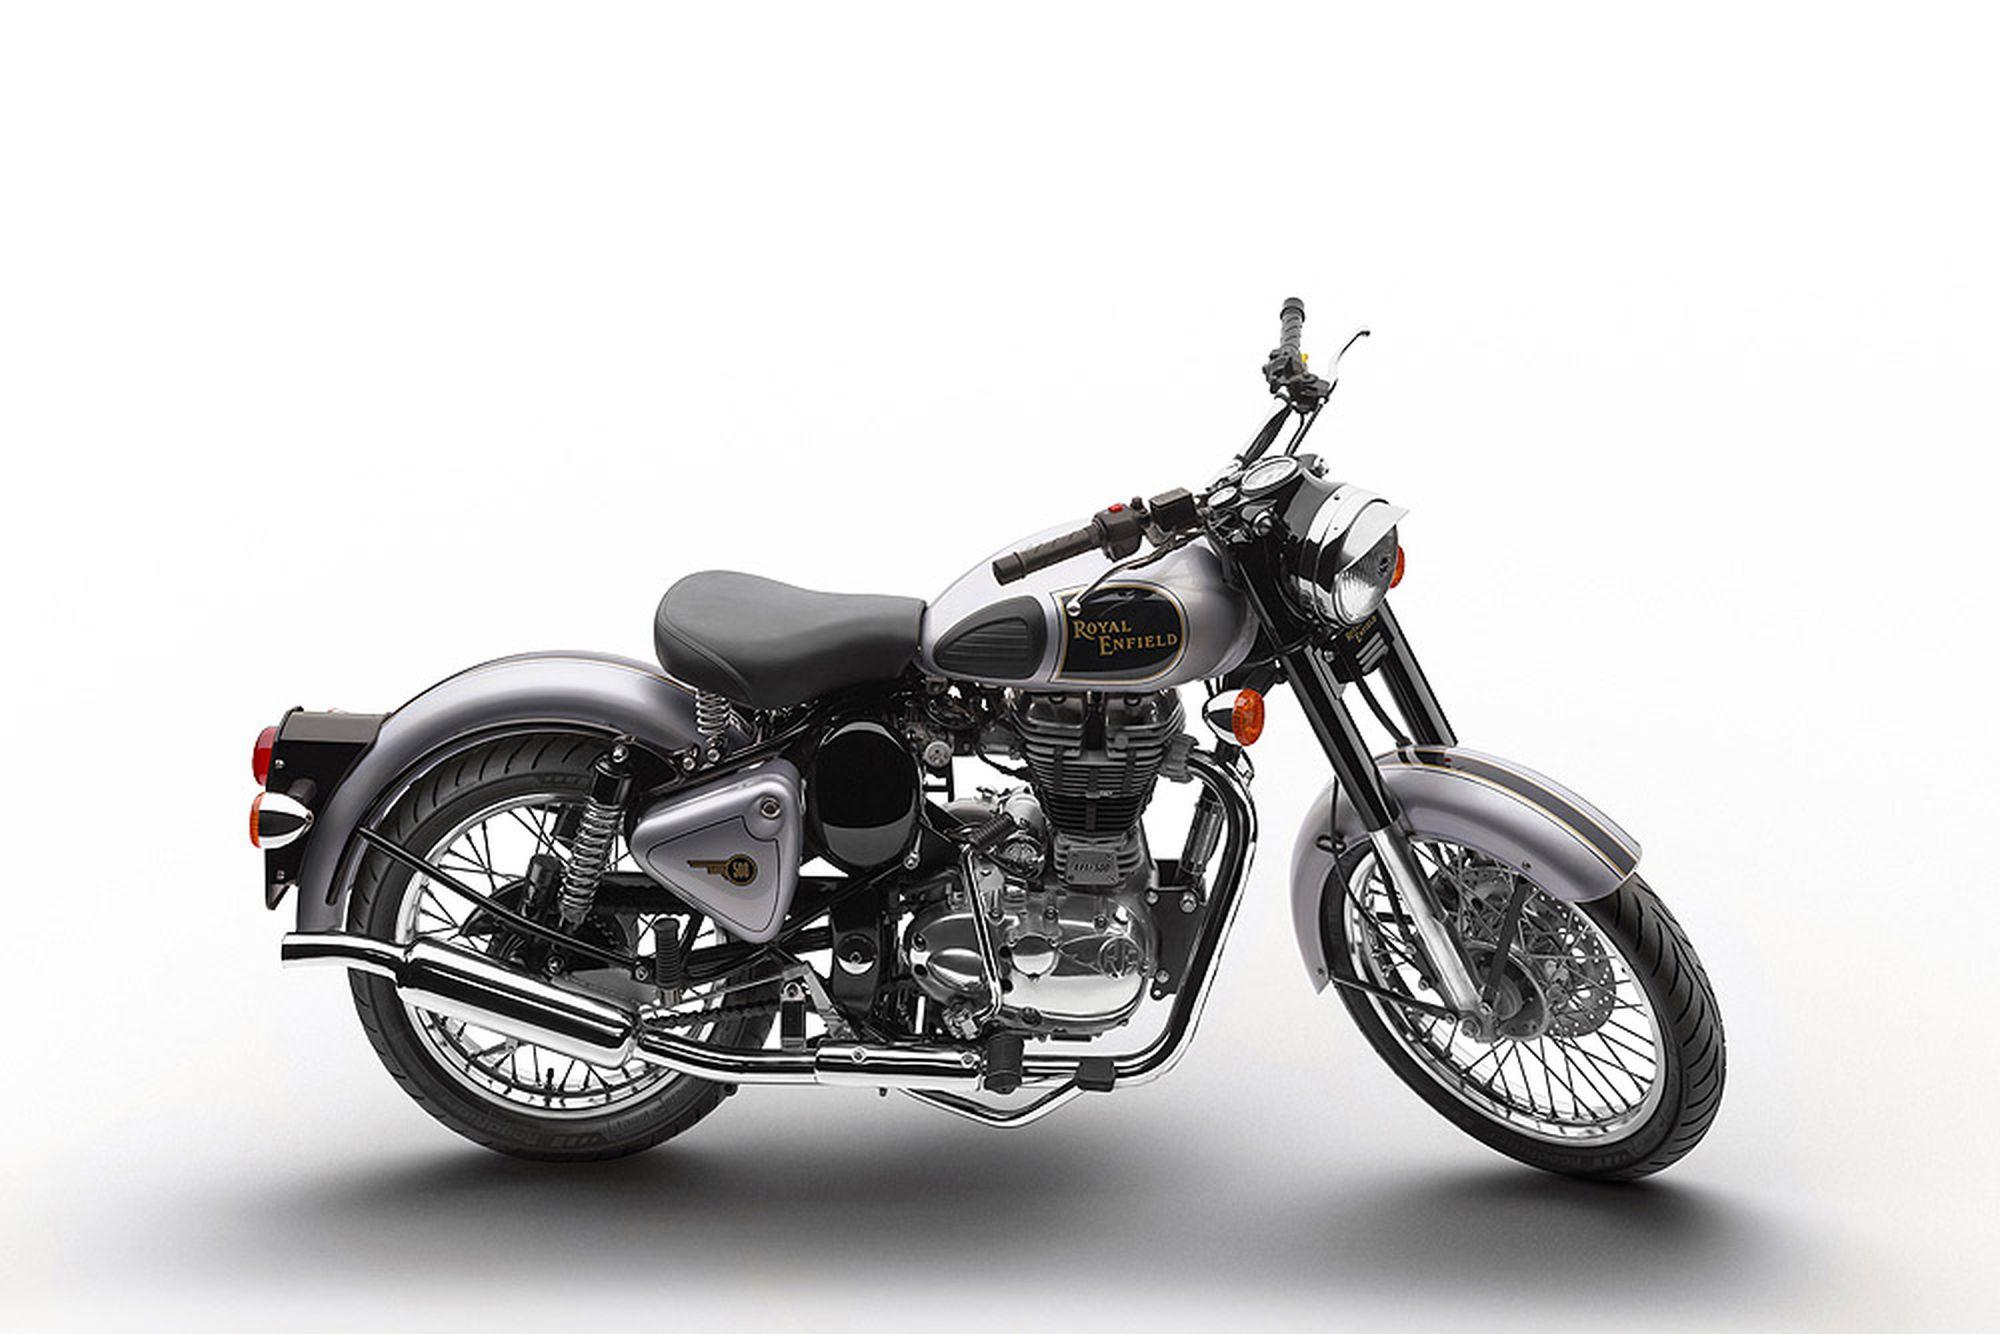 motorrad occasion royal enfield bullet 500 classic efi kaufen. Black Bedroom Furniture Sets. Home Design Ideas